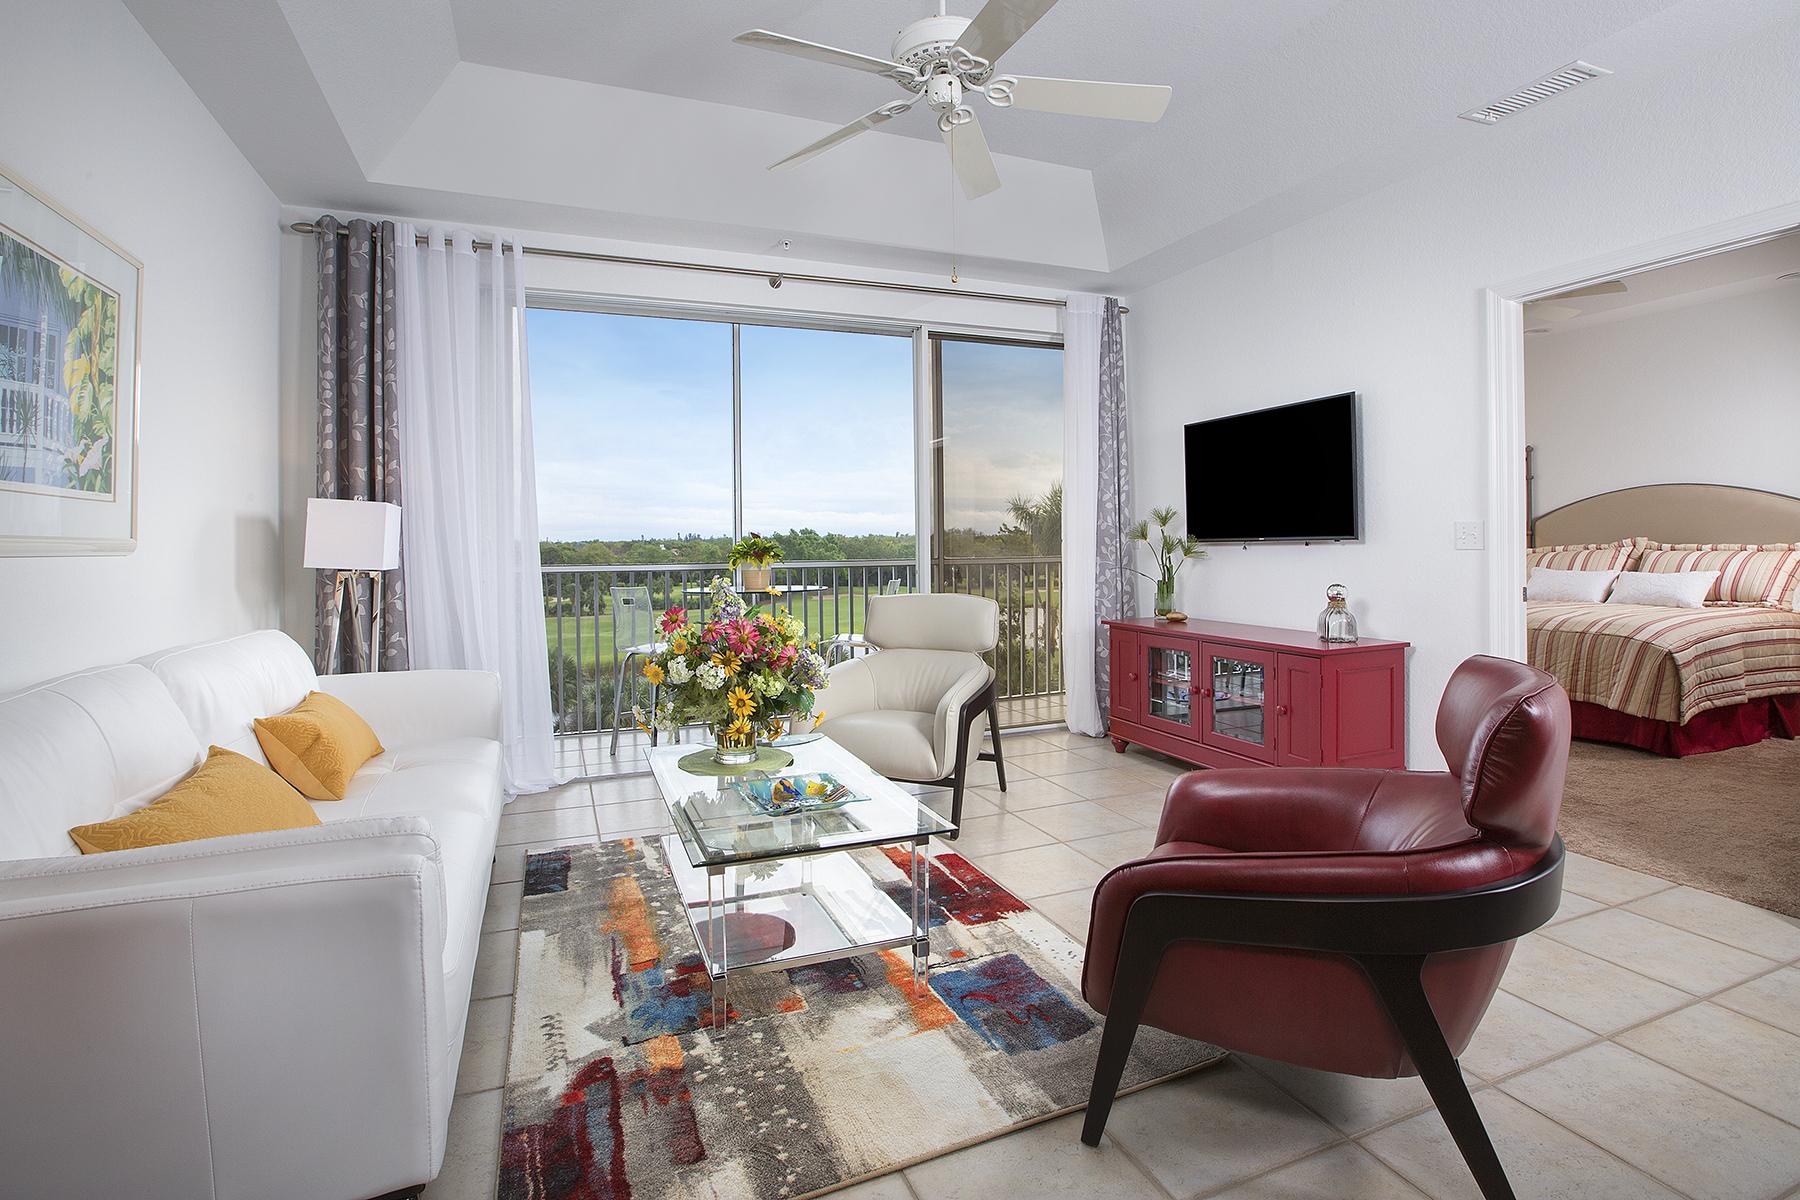 Condominium for Sale at Naples 7671 Pebble Creek Cir 402, Pelican Bay, Naples, Florida, 34108 United States